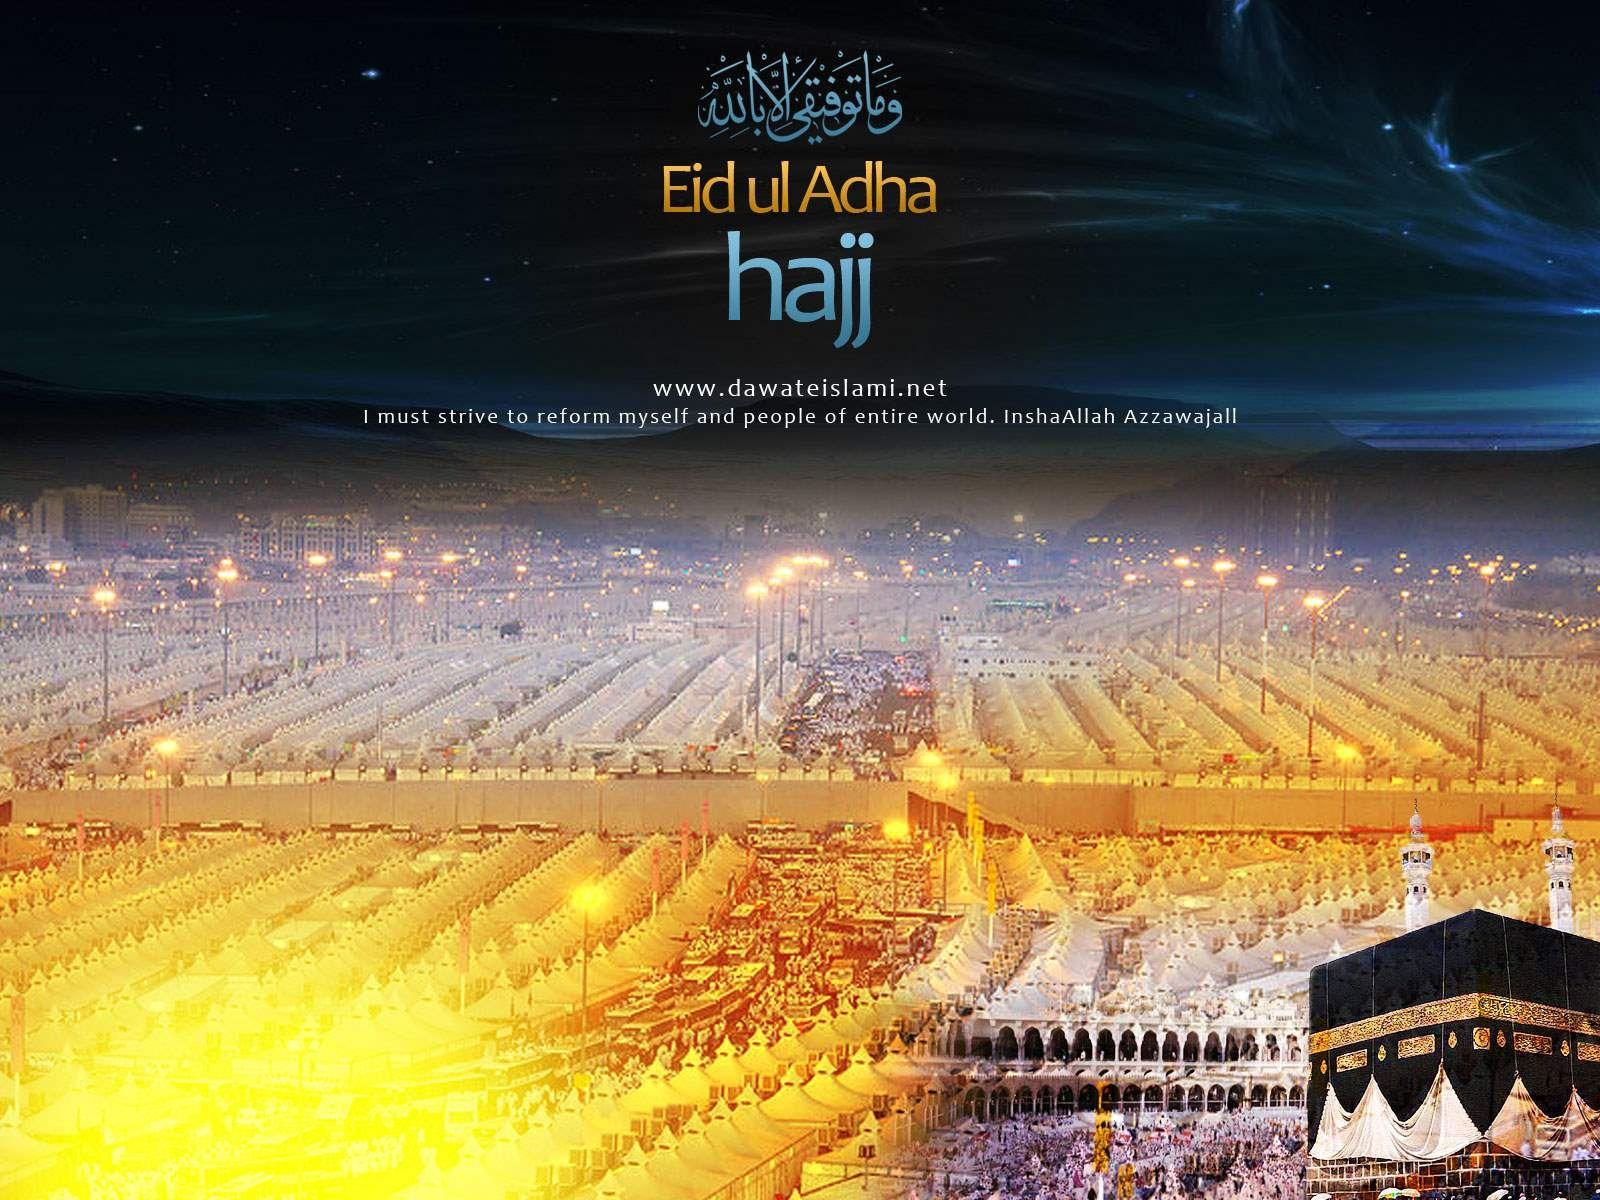 Hajj Eid Al Adha 2015 Hd Wallpapers And Greeting Cards Hamid